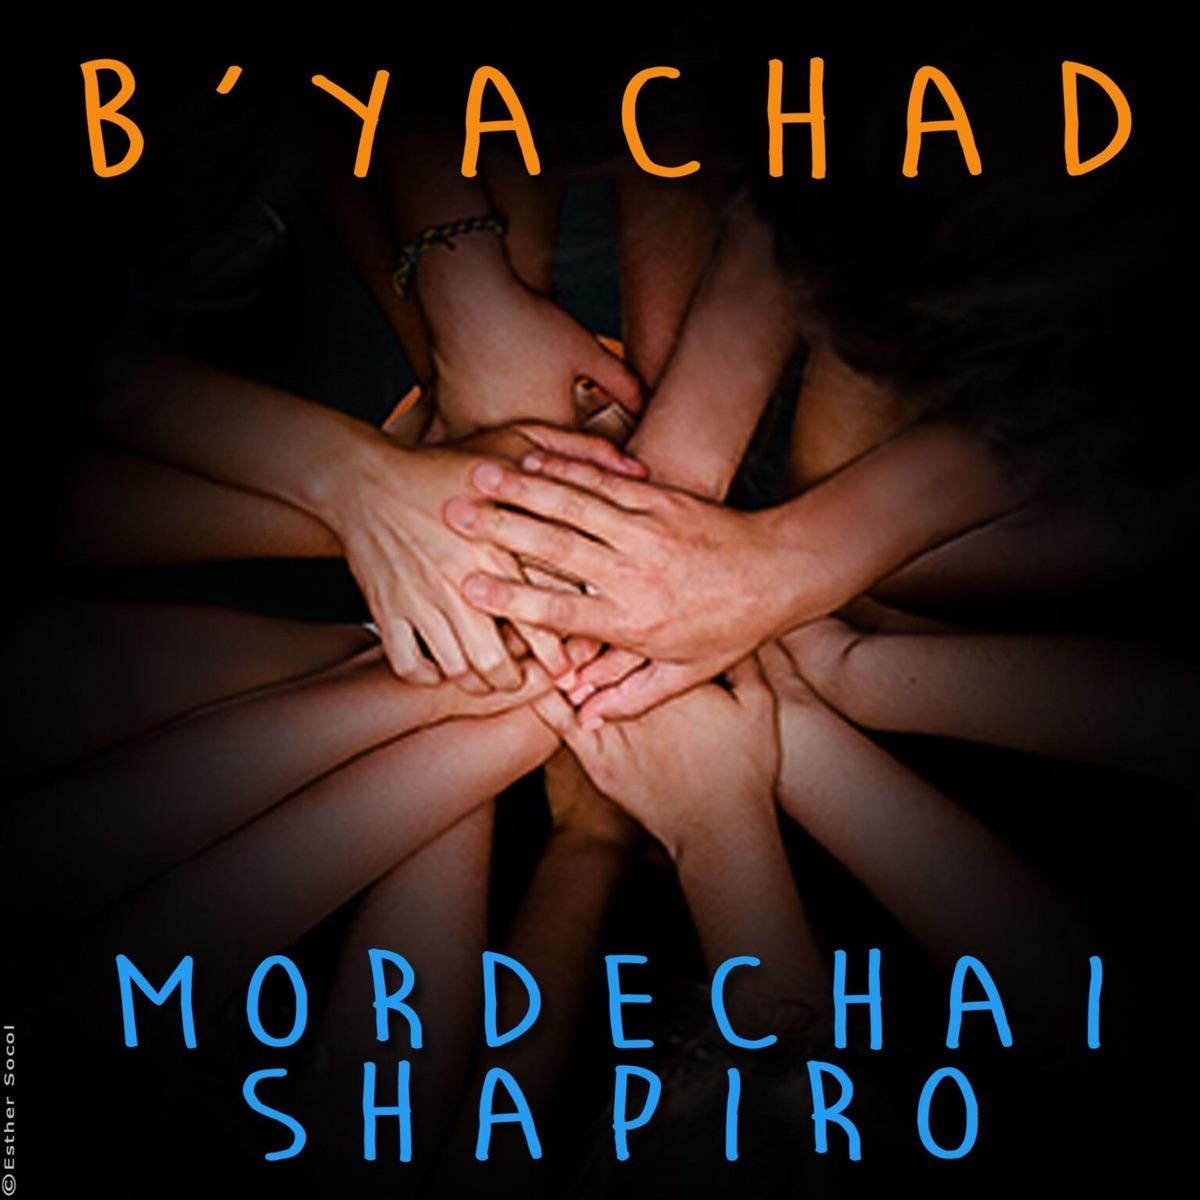 Byachad - Single Mordechai Shapiro CD cover